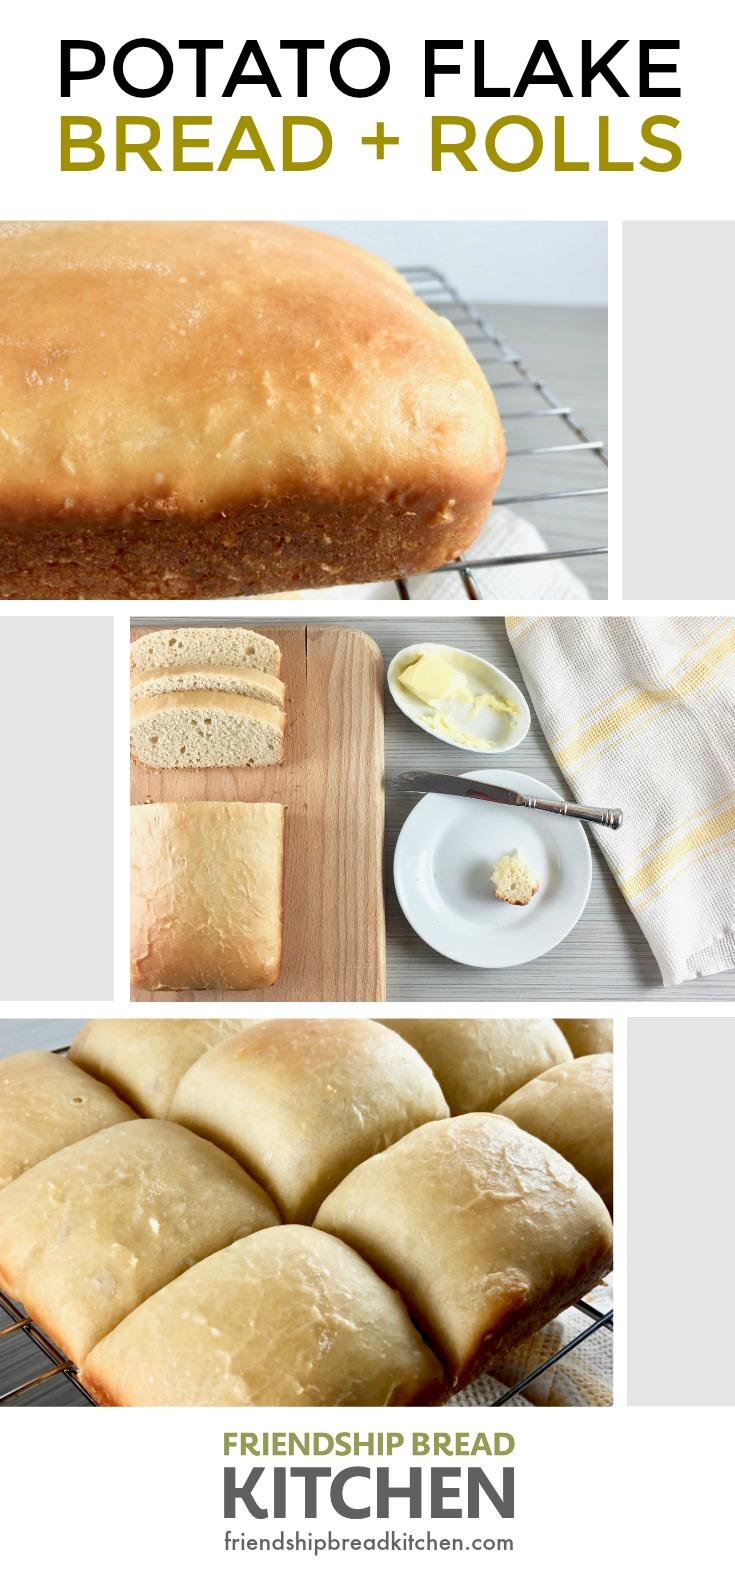 Potato Flake Amish Friendship Bread + Rolls | friendshipbreadkitchen.com